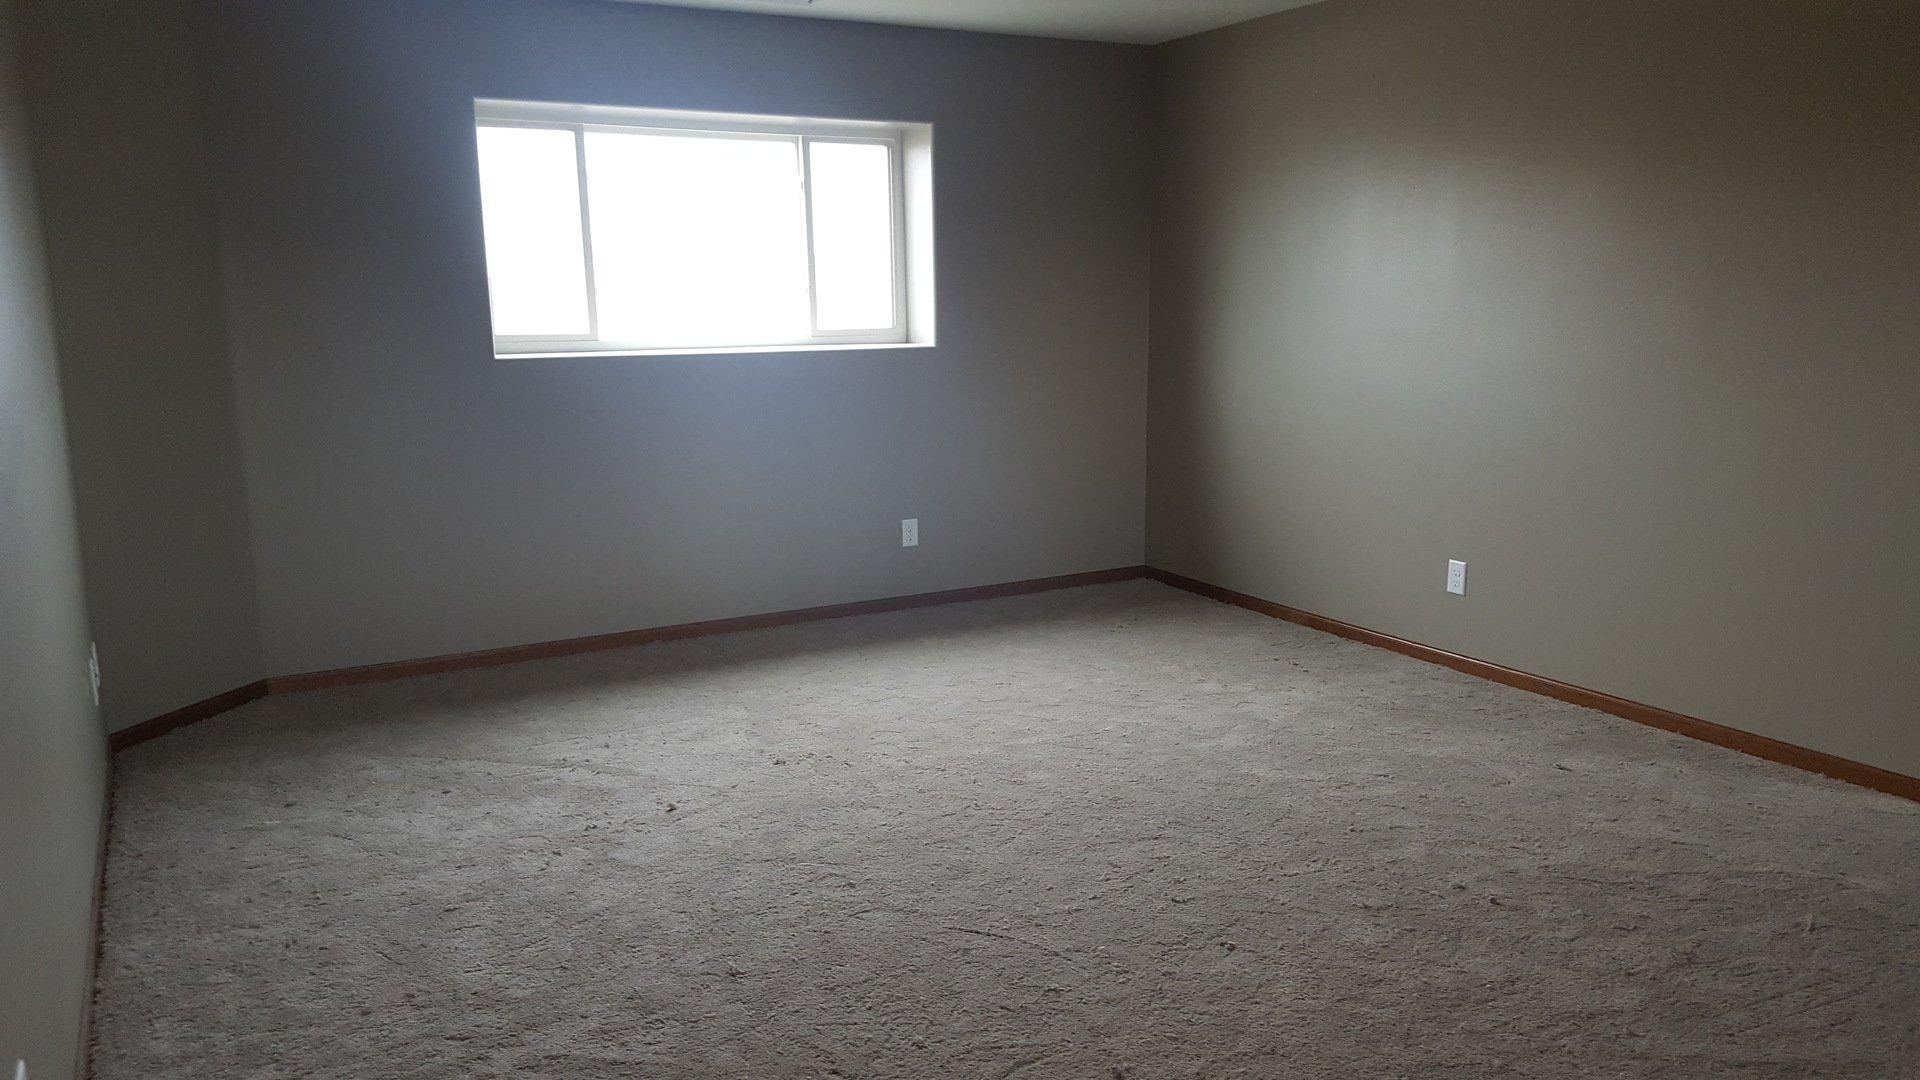 spec basement